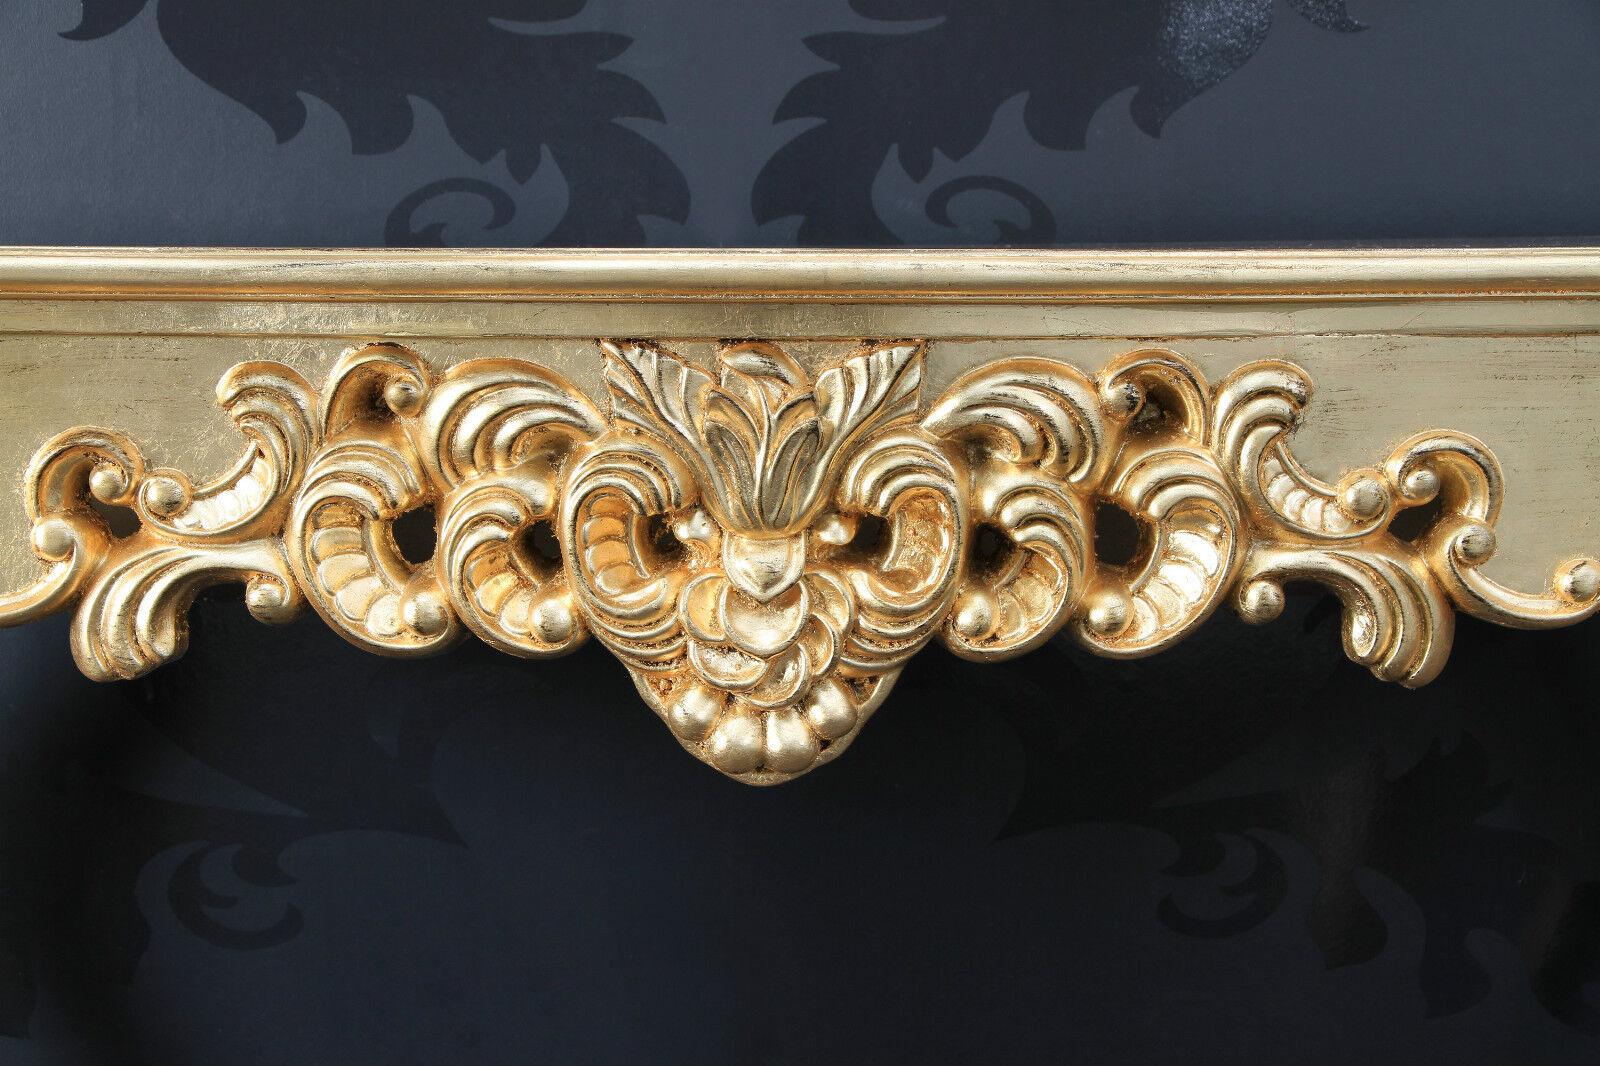 konsole sideboard gold antik finish luxuri s prunkvoll barock rokoko ablage 85cm ebay. Black Bedroom Furniture Sets. Home Design Ideas